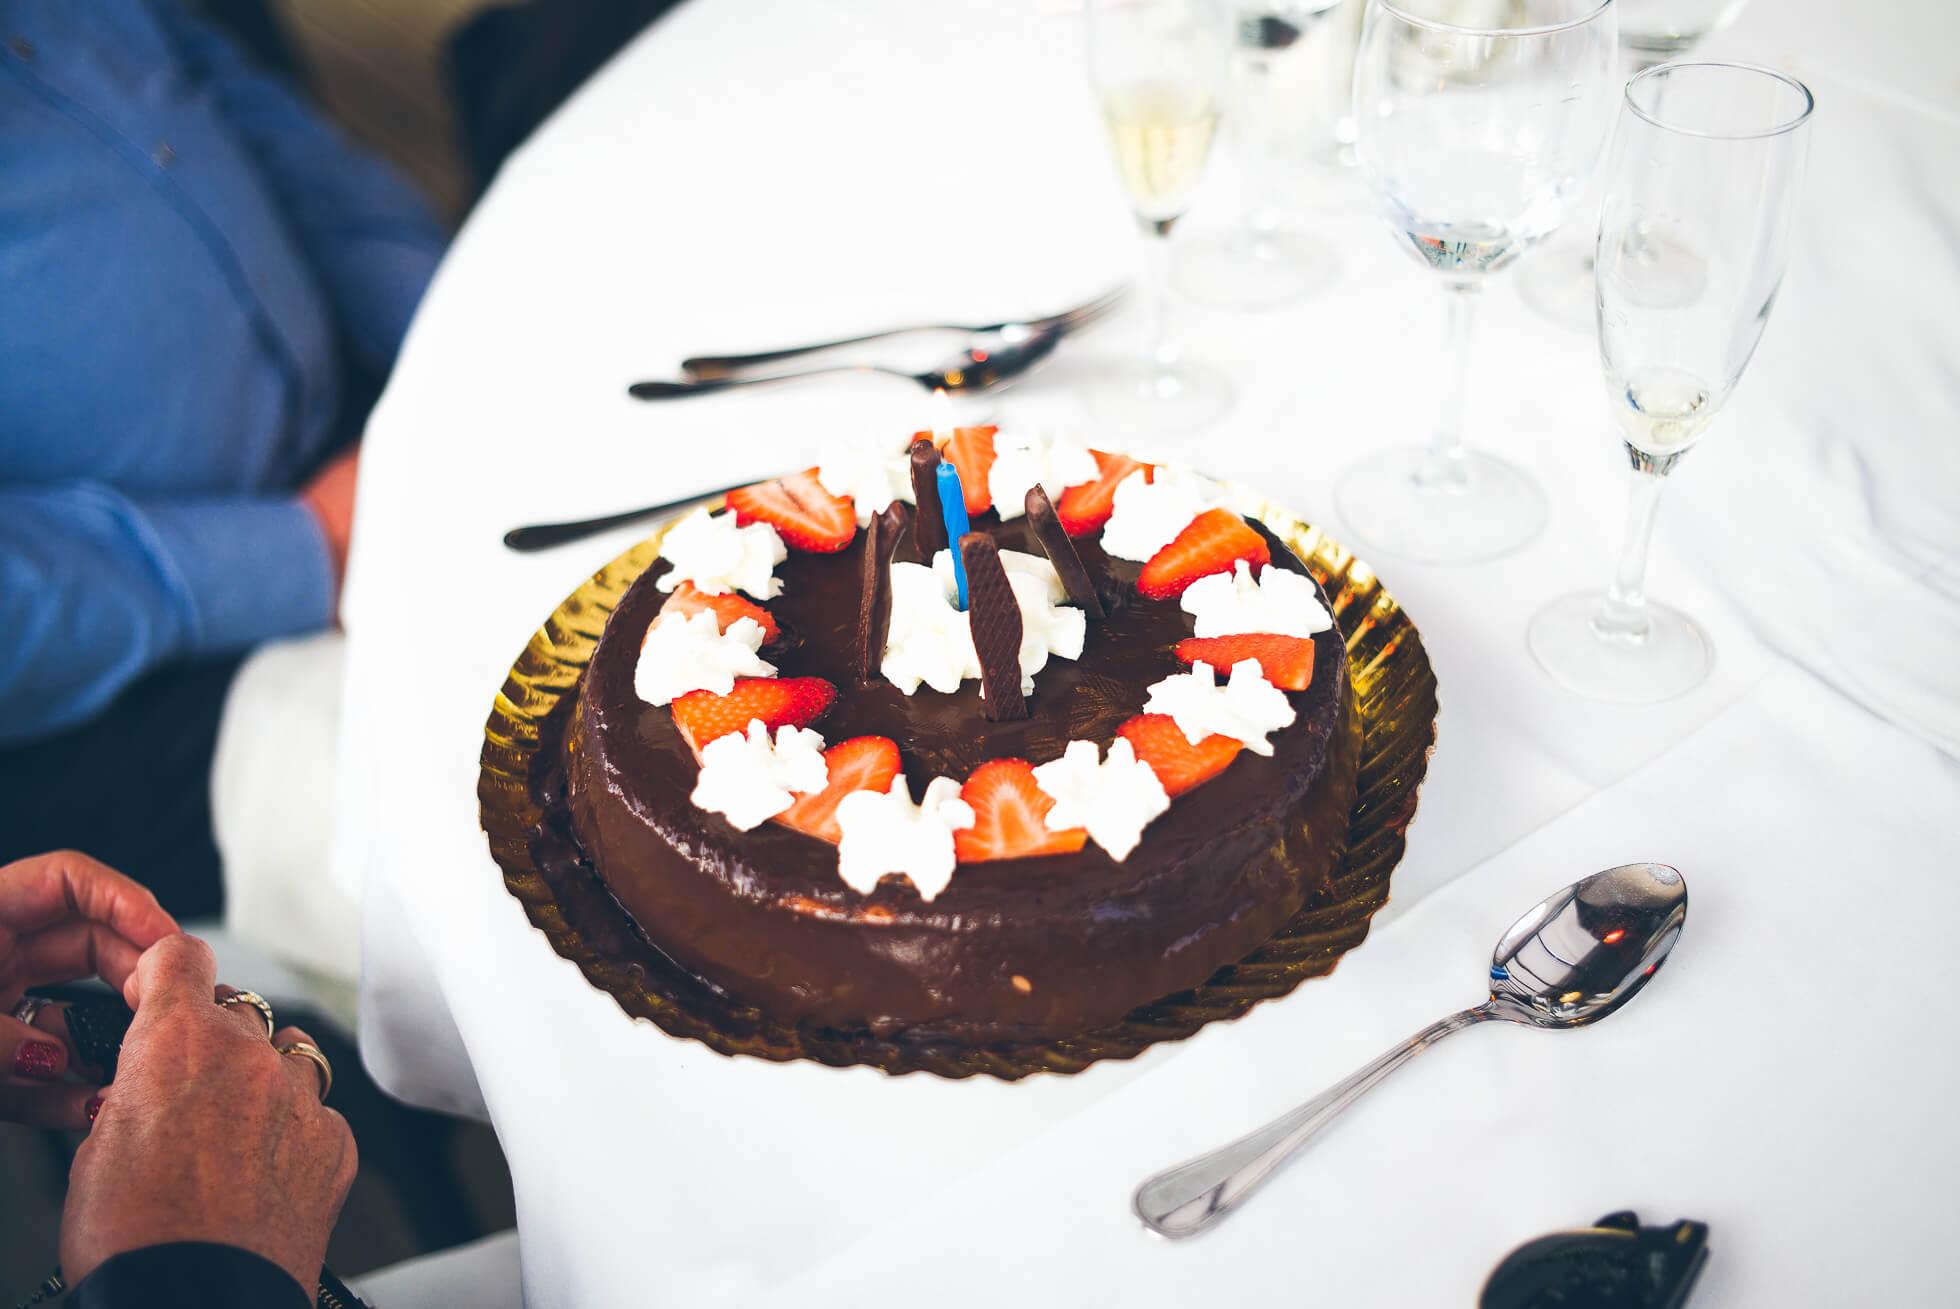 janni-deler-bday-cakeL1008946